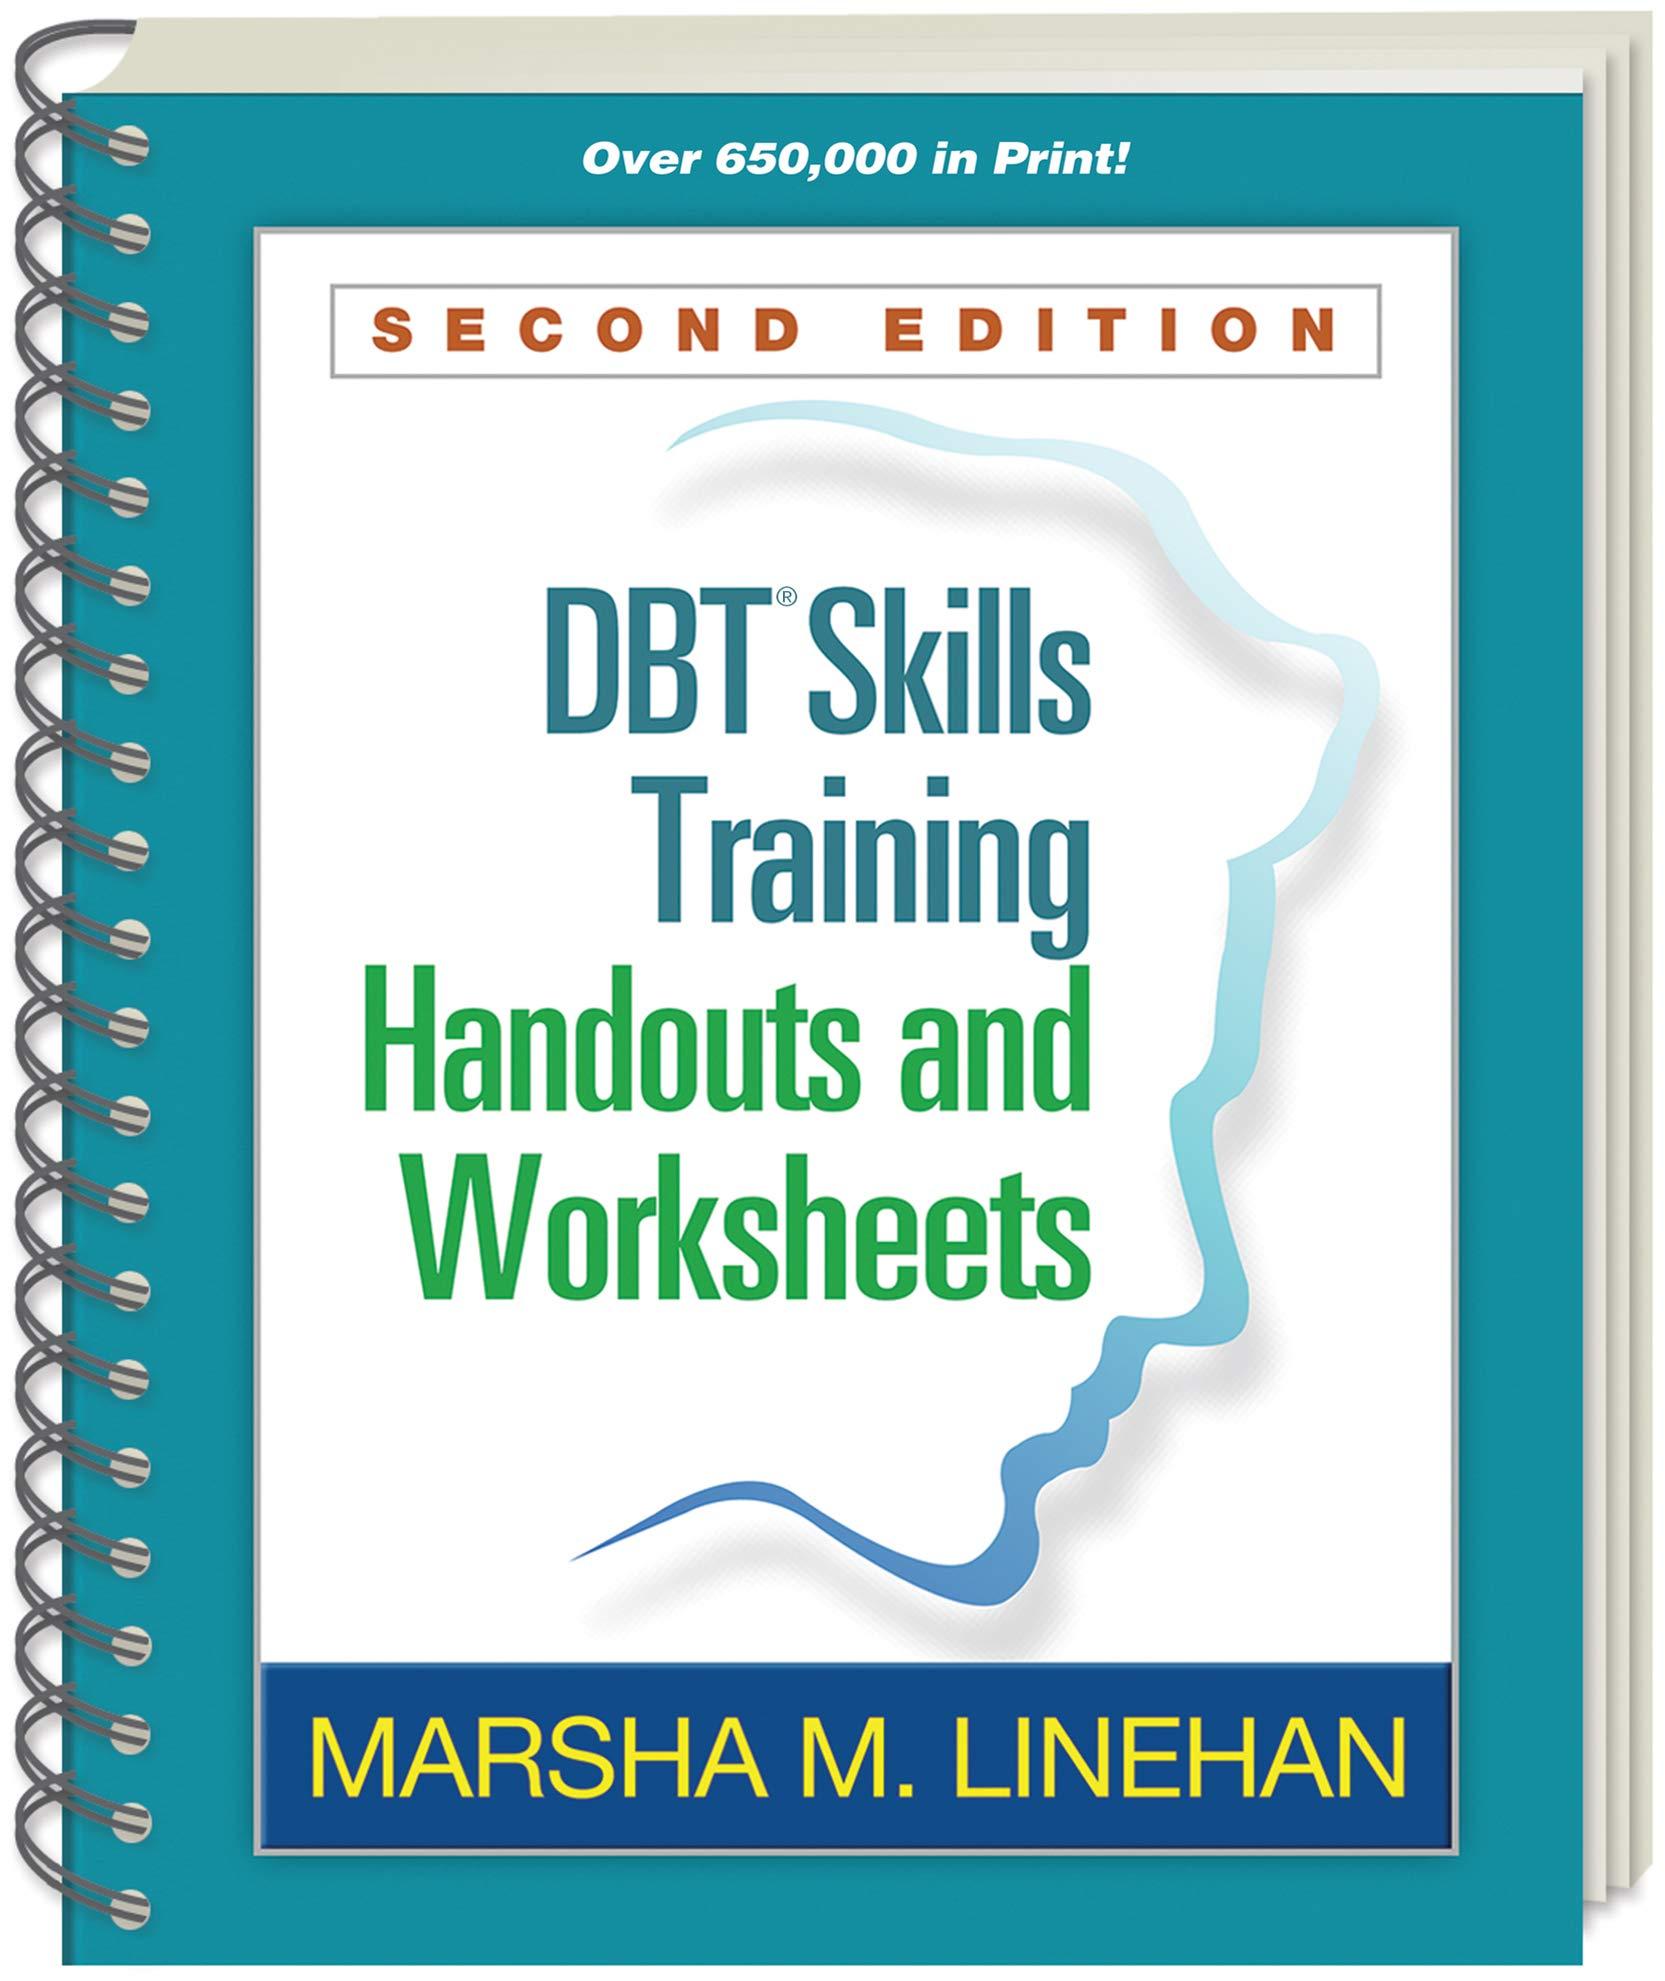 Worksheets Dbt Worksheets skills training handouts and worksheets second edition marsha m linehan 9781572307810 psychiatry amazon